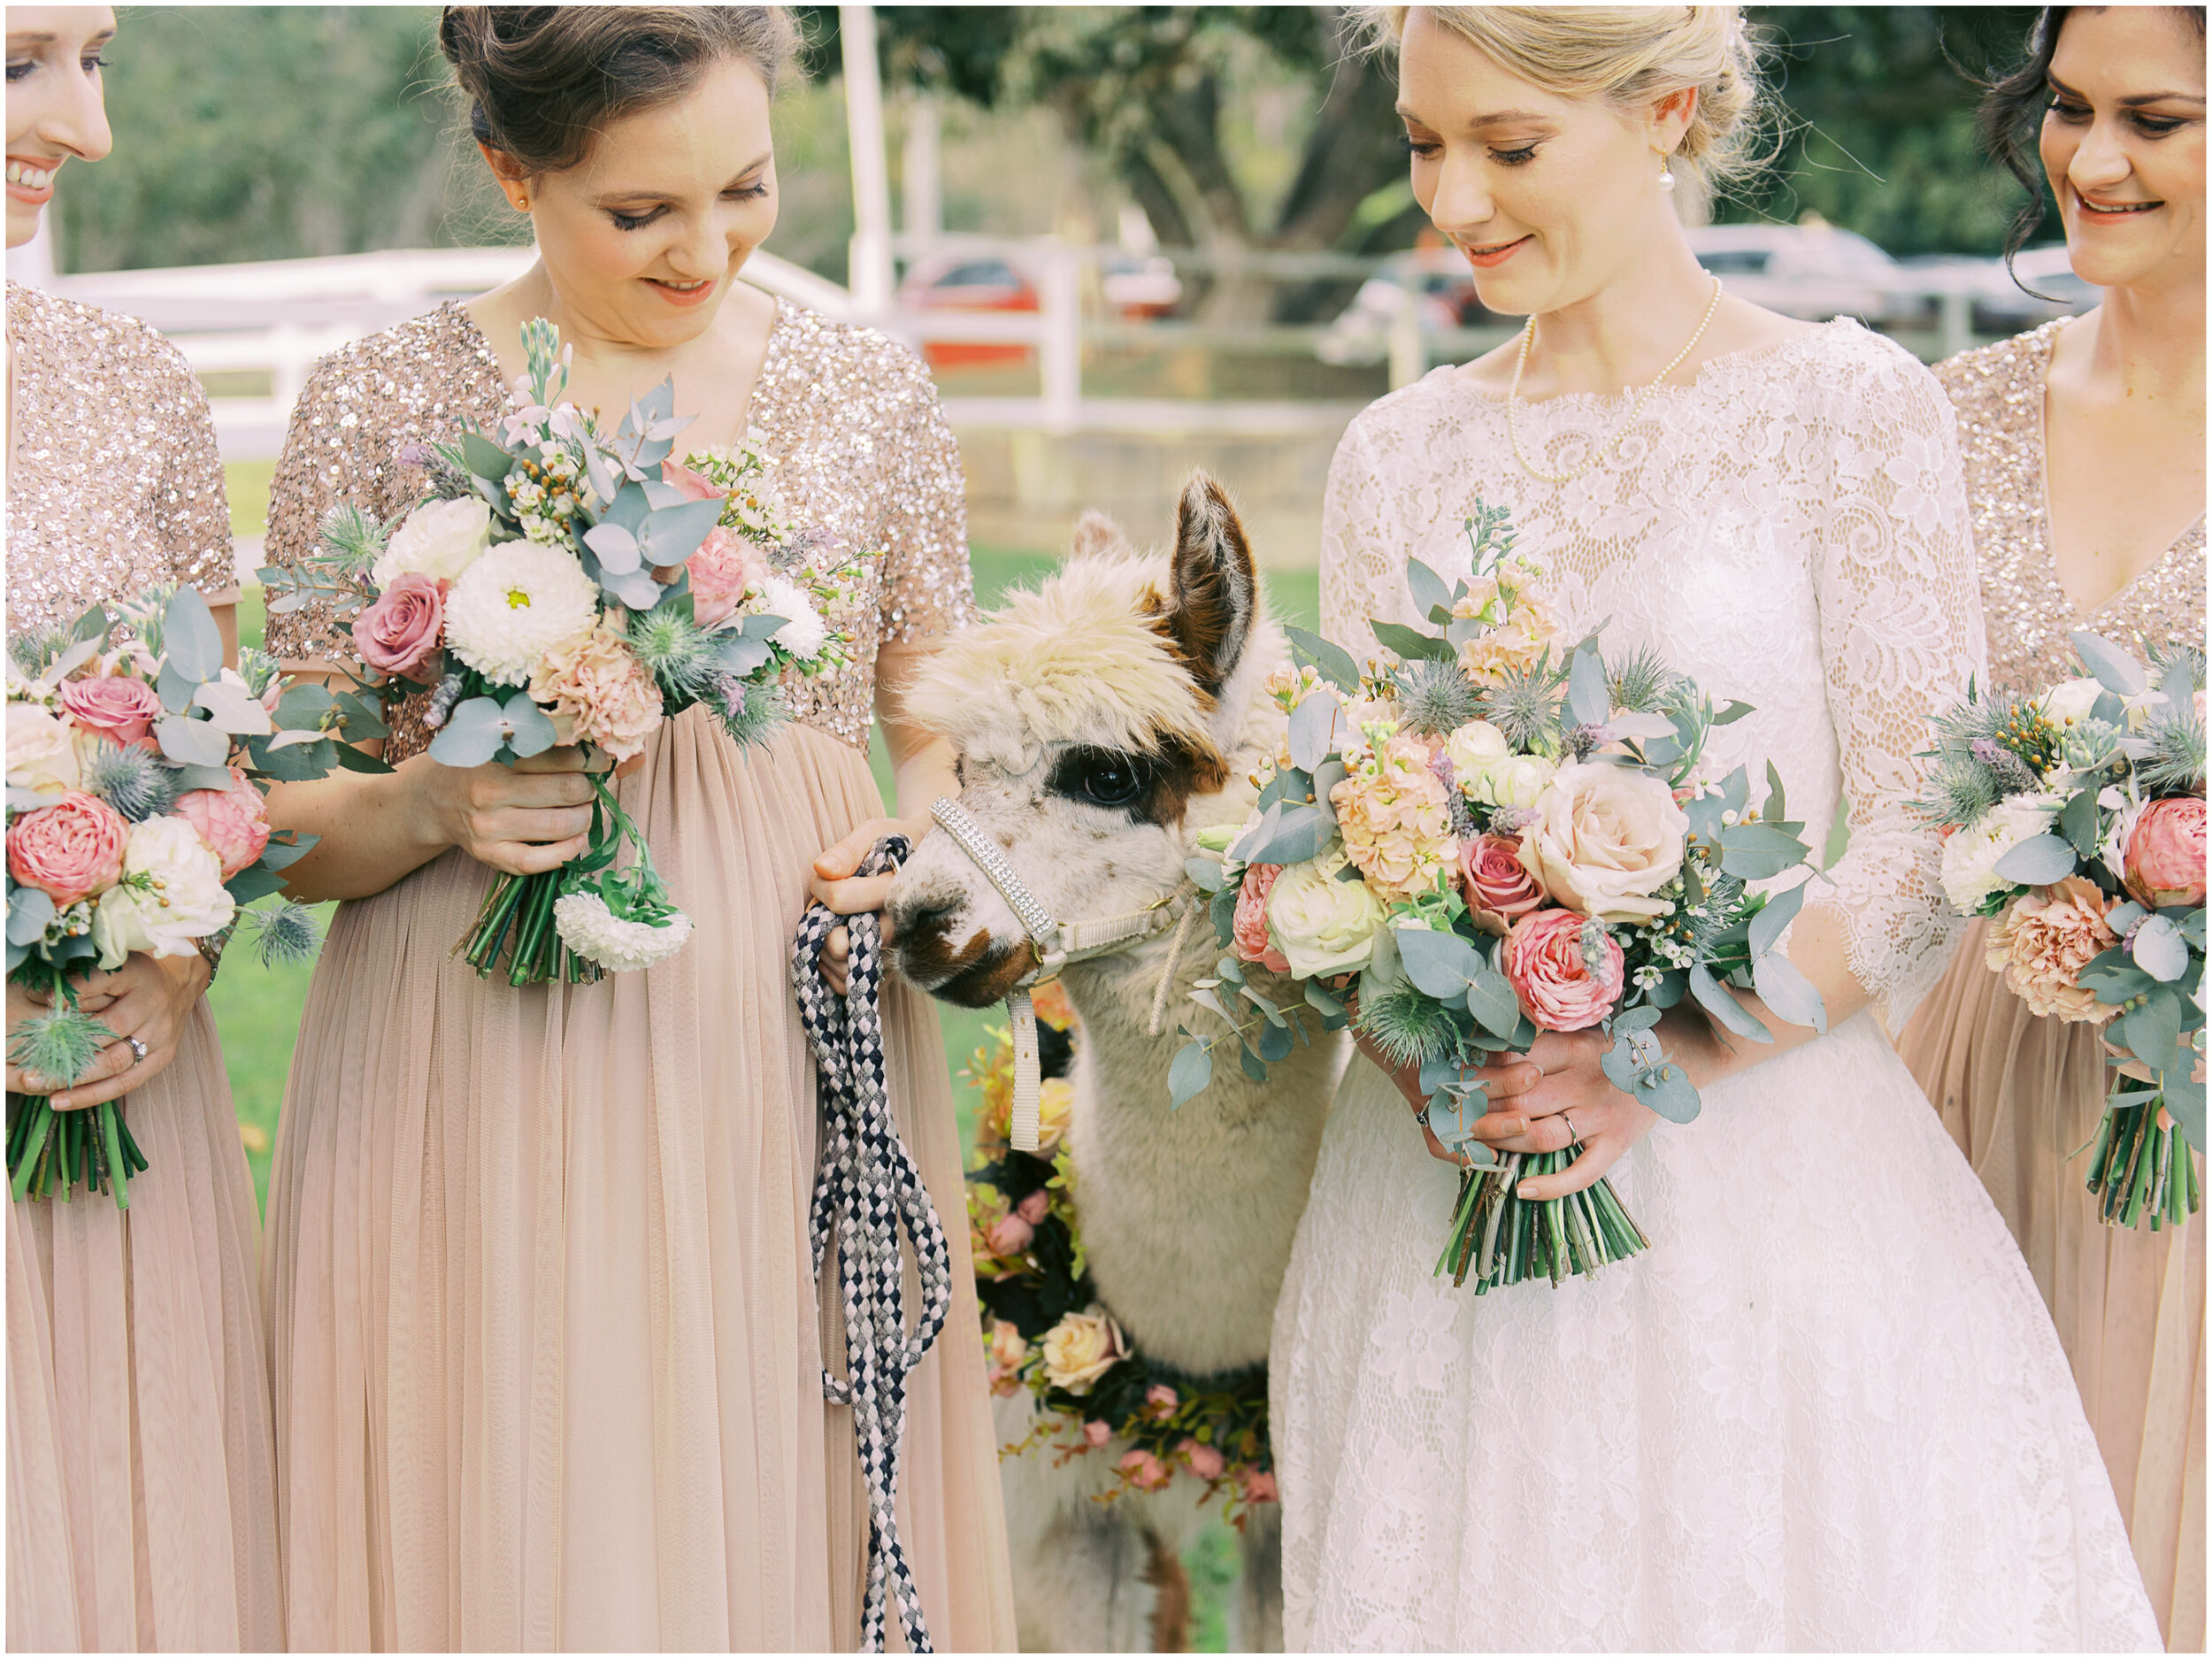 brisbane-film-wedding-photographer-lauren-olivia-luxury-wedding-australia-01-13.jpg